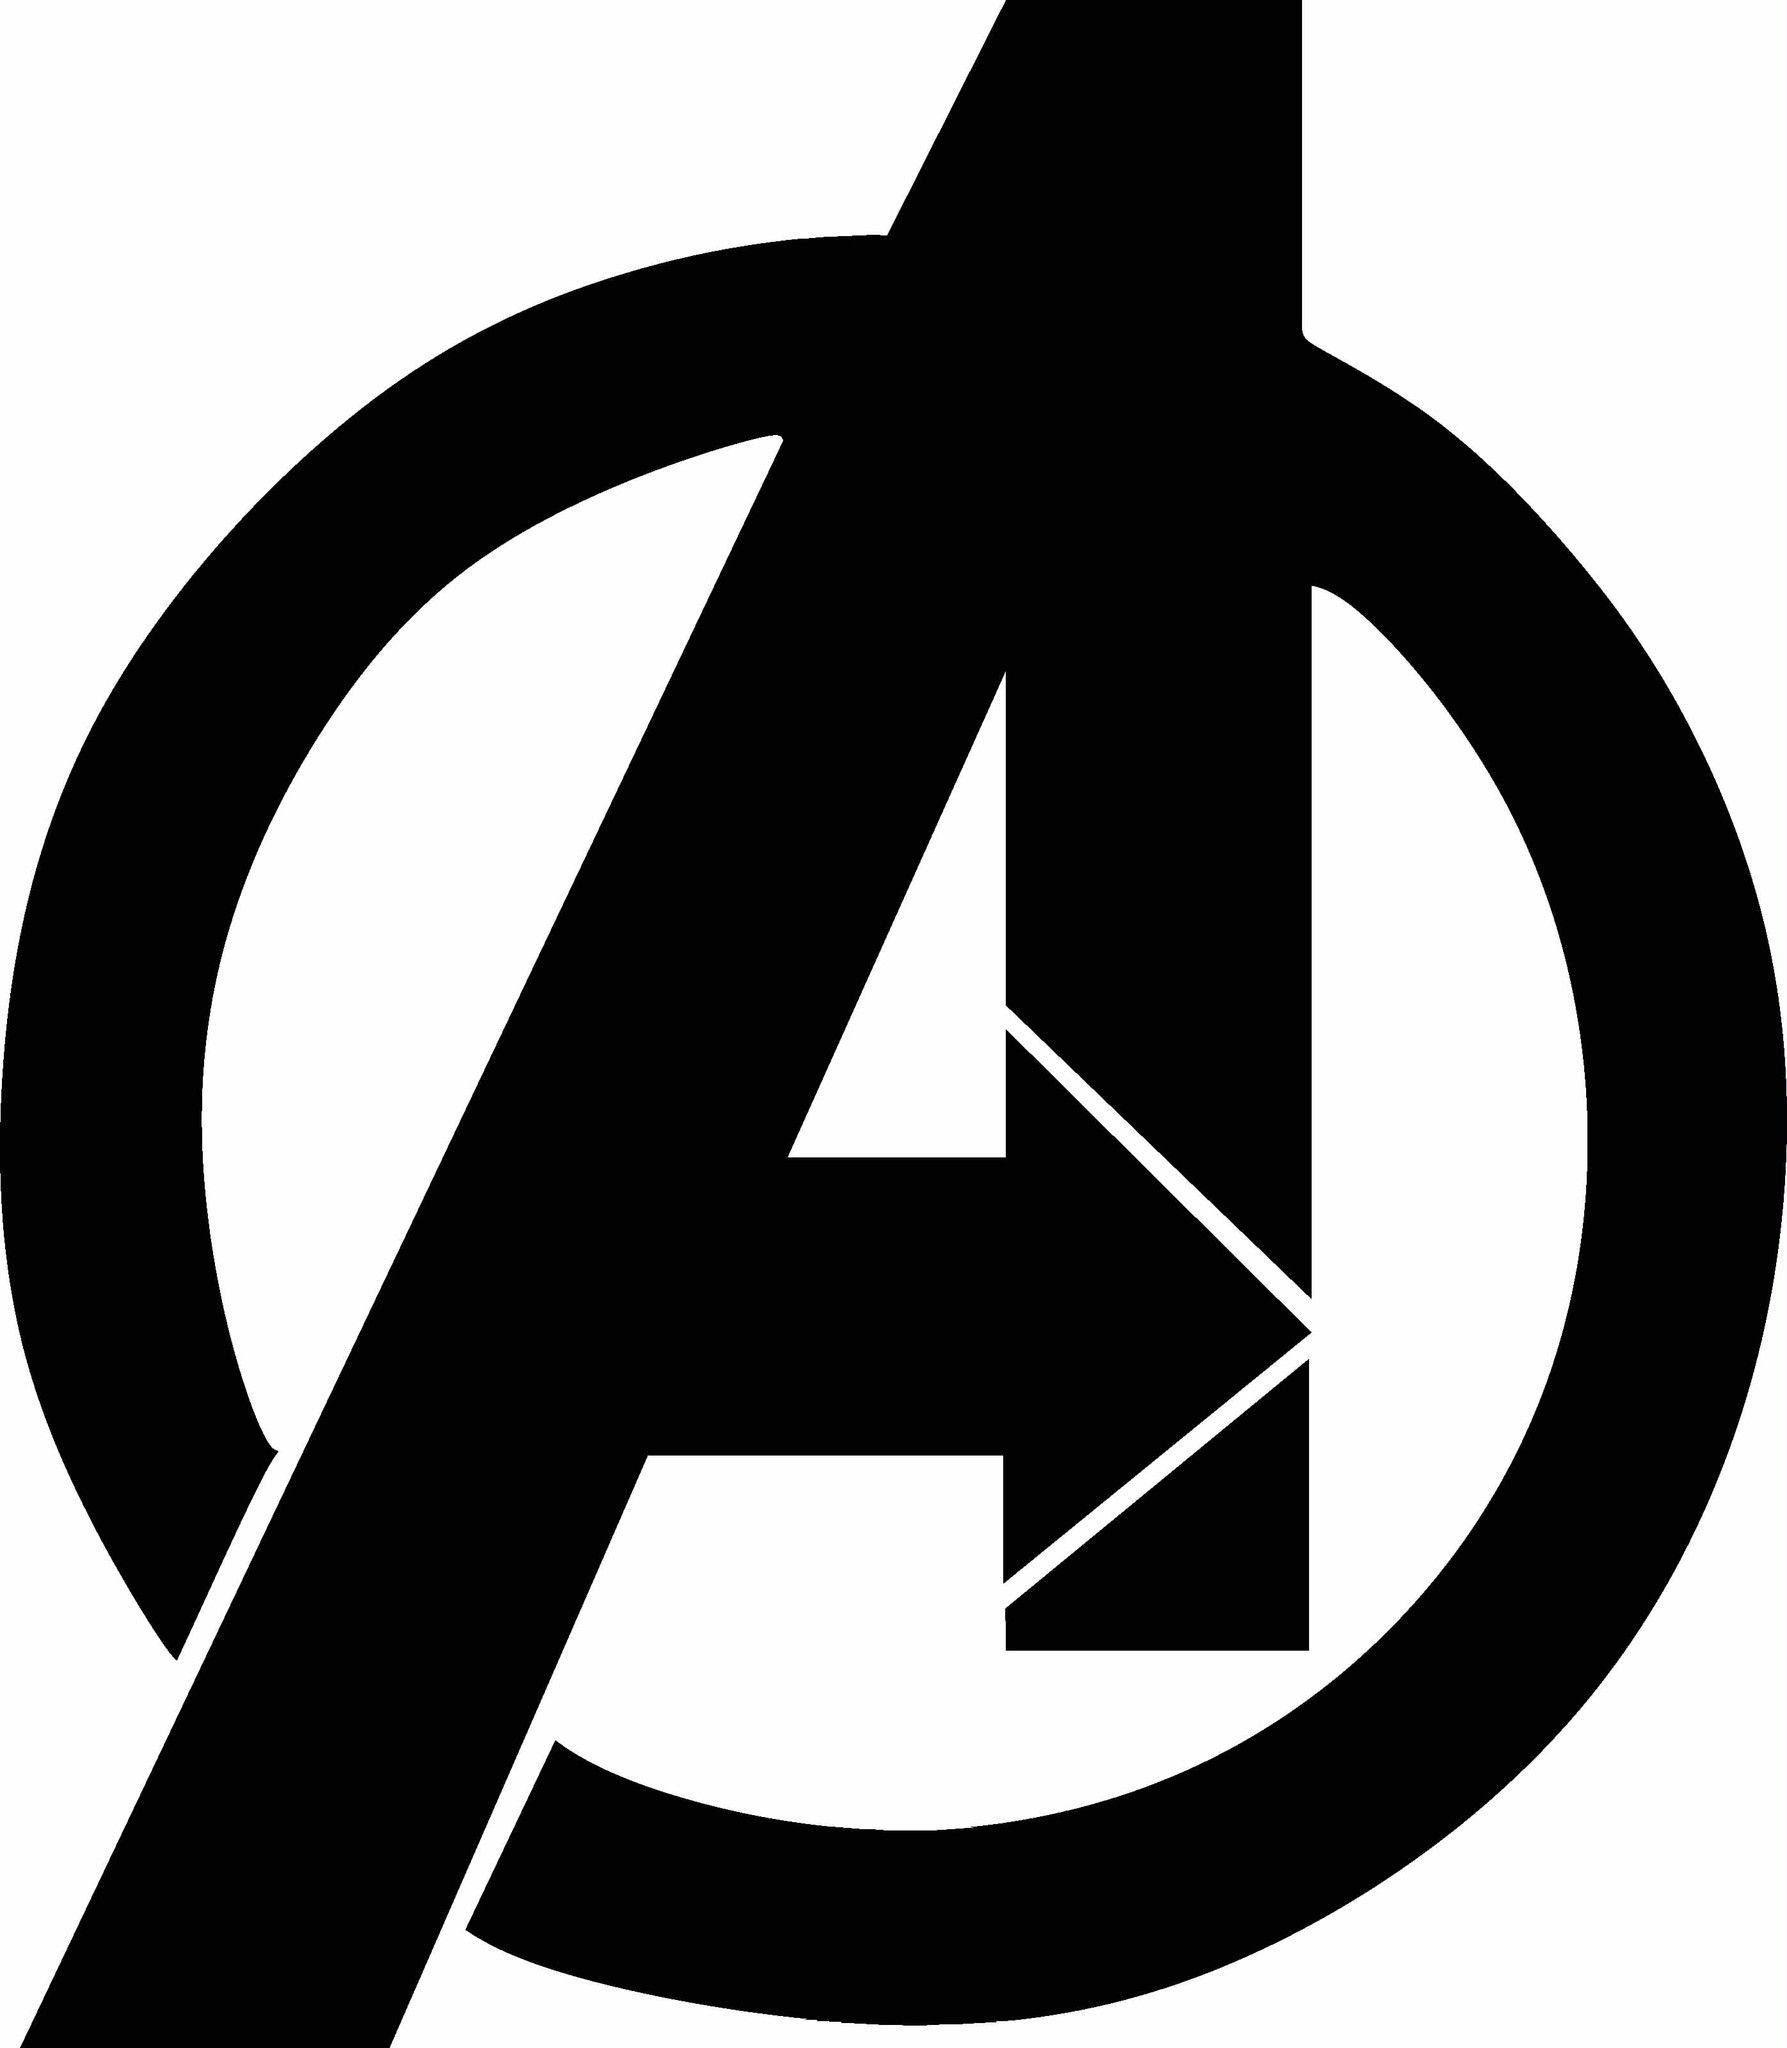 Logo vinyl decal graphic. Avengers clipart symbol